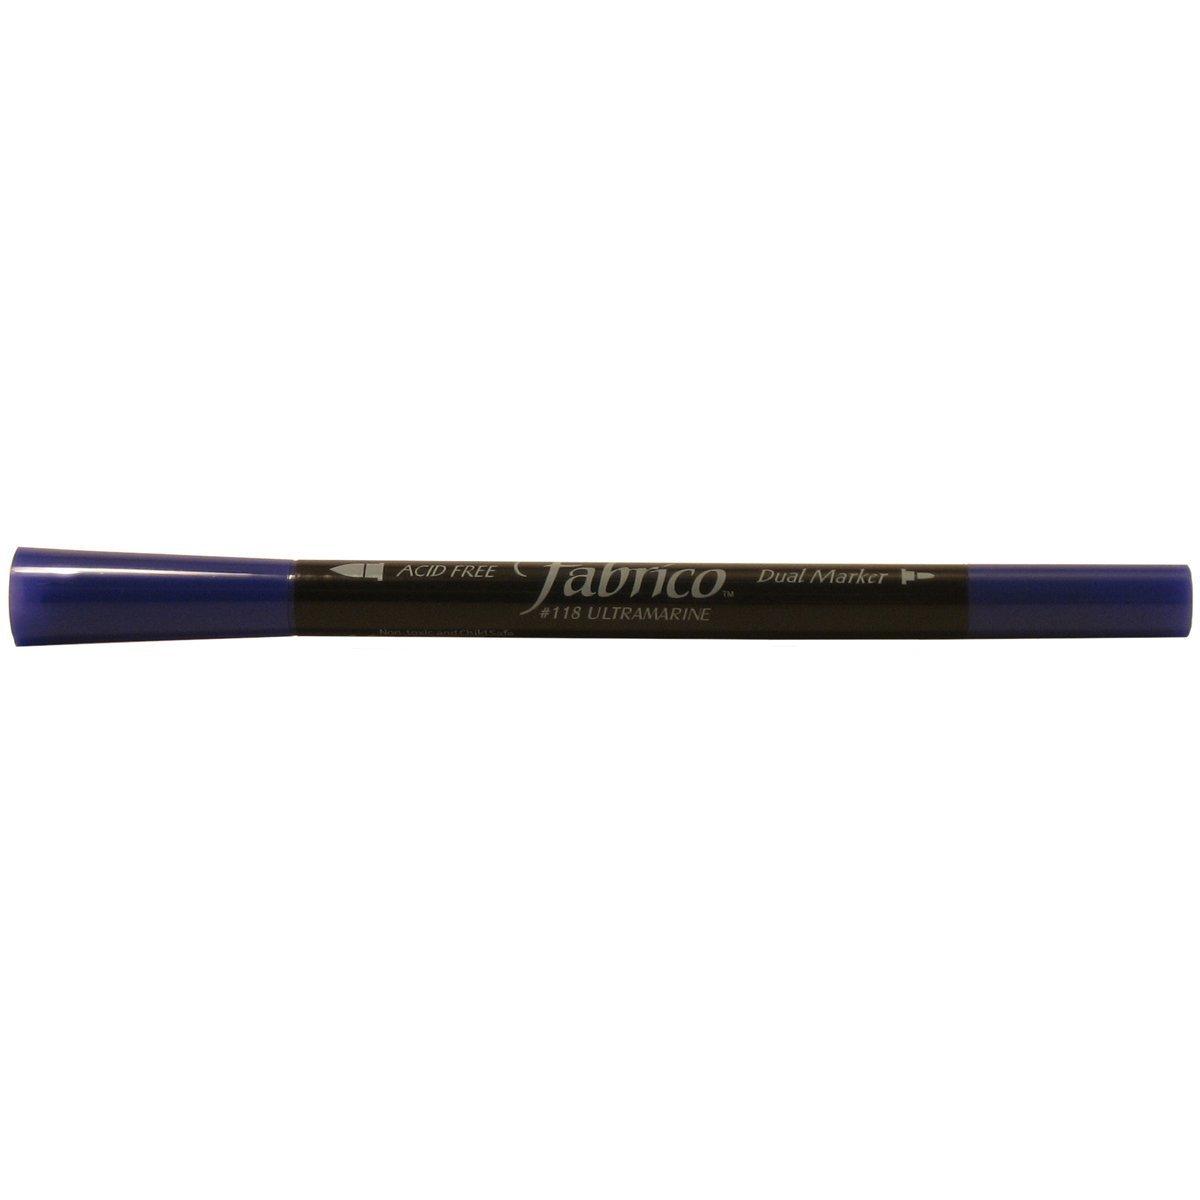 118 Ultramarine - Fabrico Dual Tip Marker